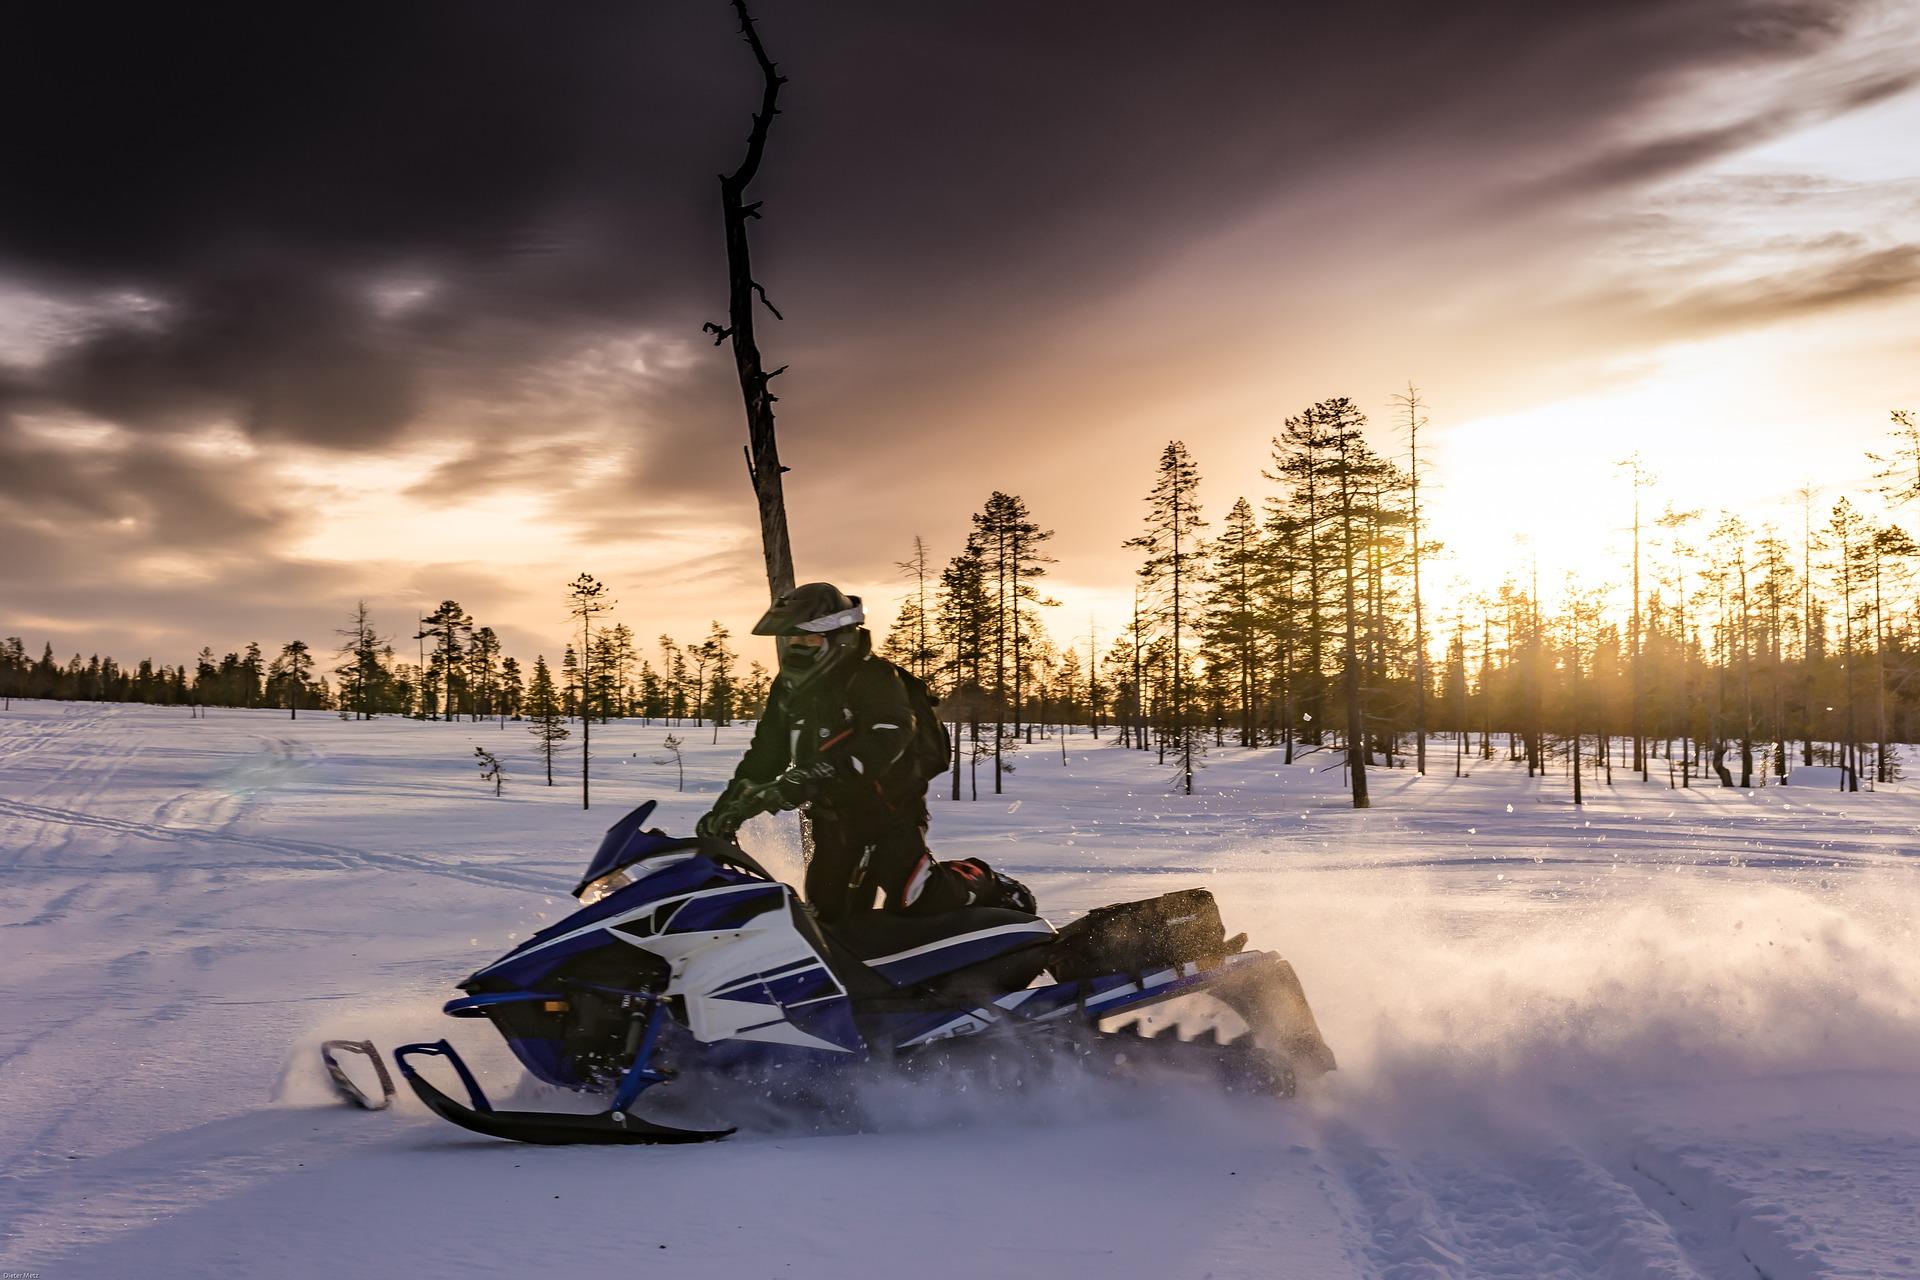 lapland- sneeuwscooters